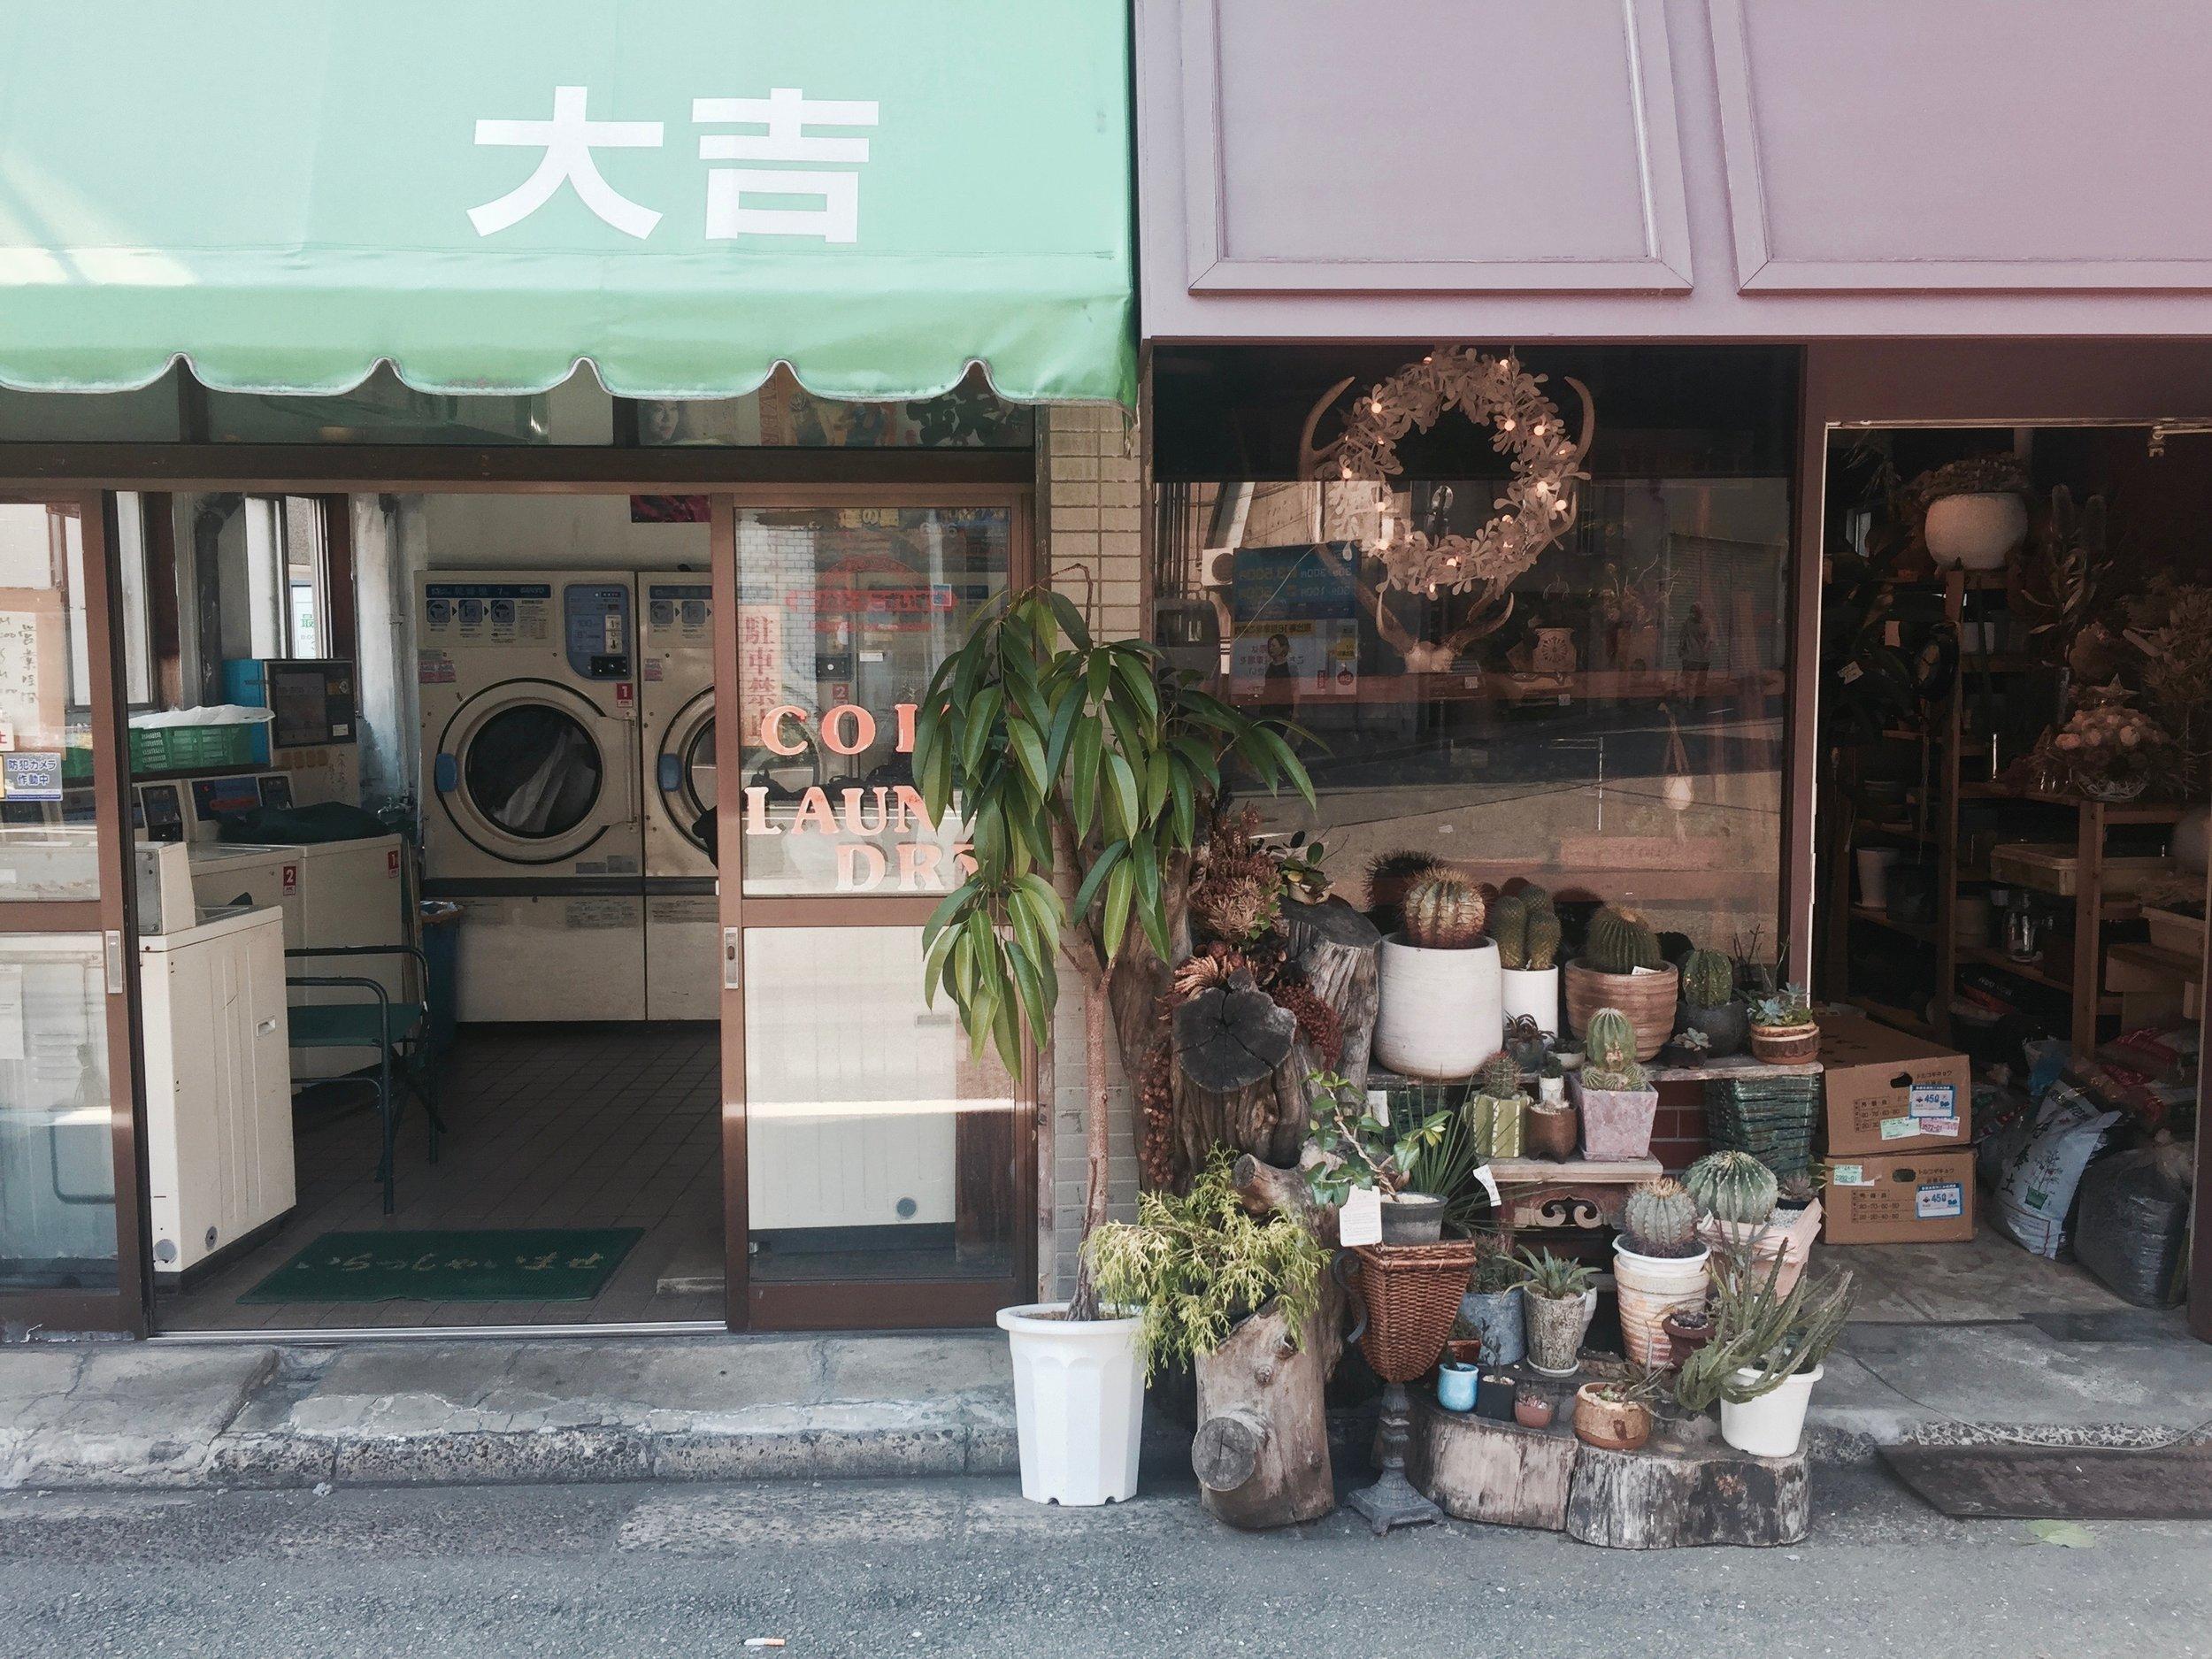 Plant shop and laundromat in Ebisu